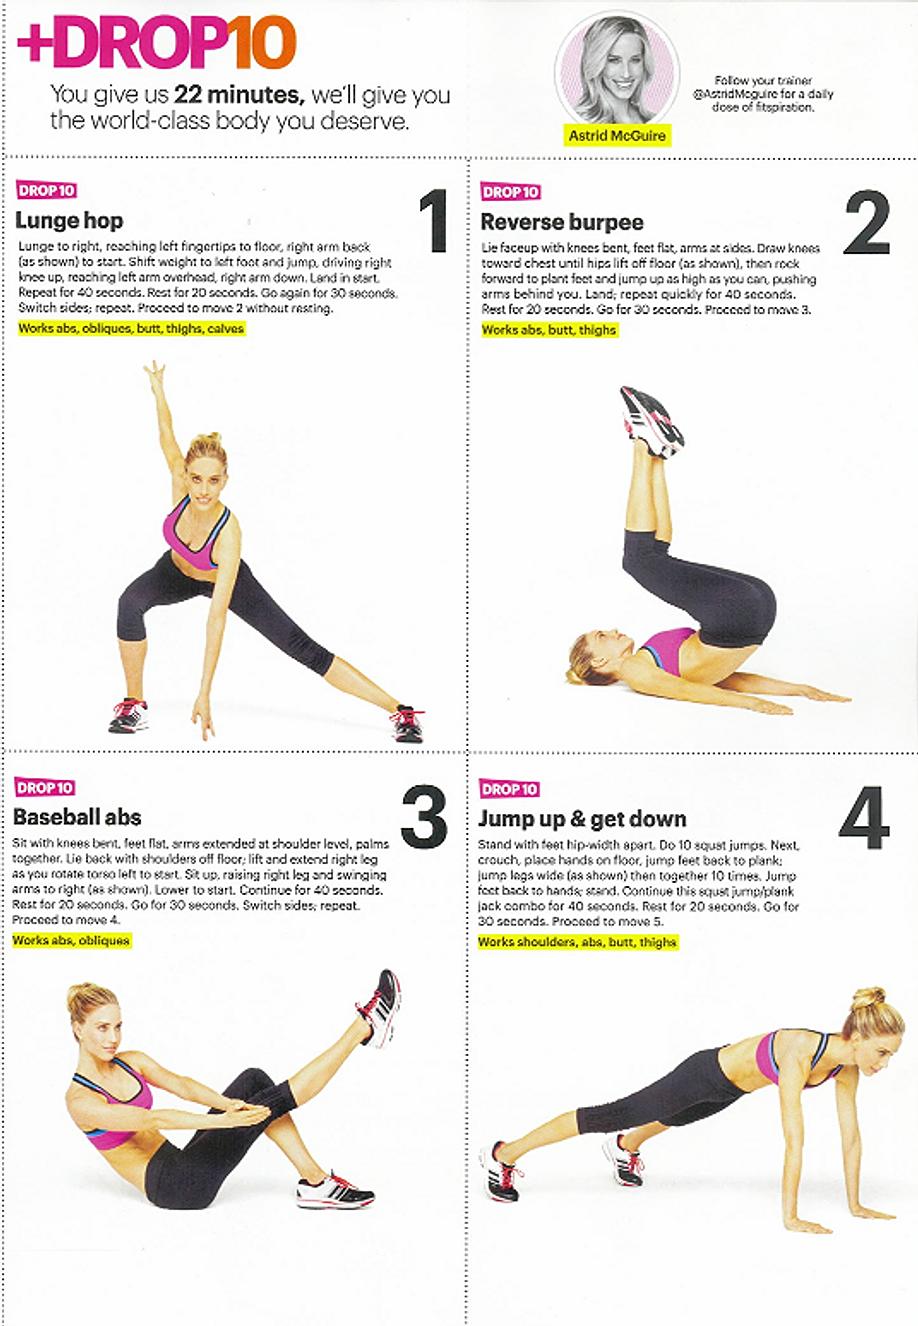 +Drop10 routine, part 1